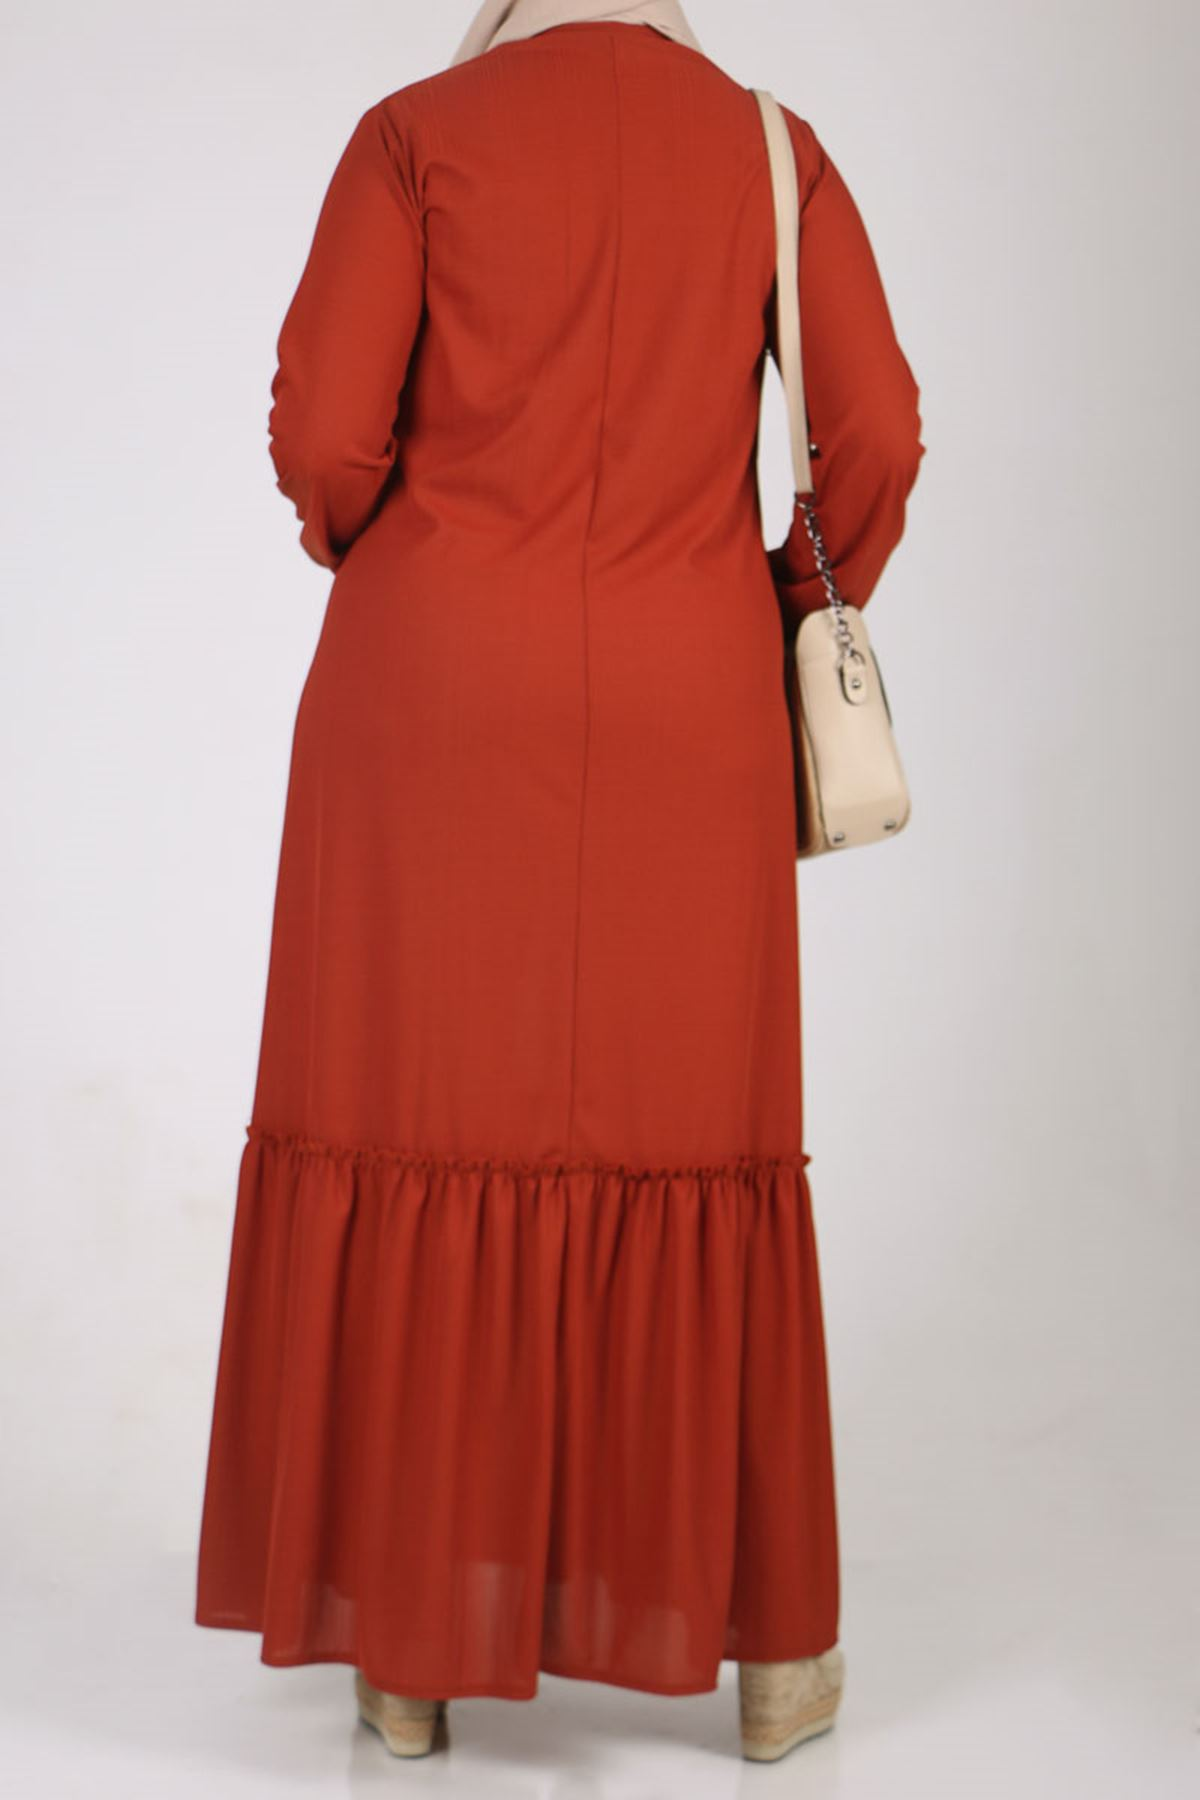 2095 فستان مقاس كبير - قرميدي